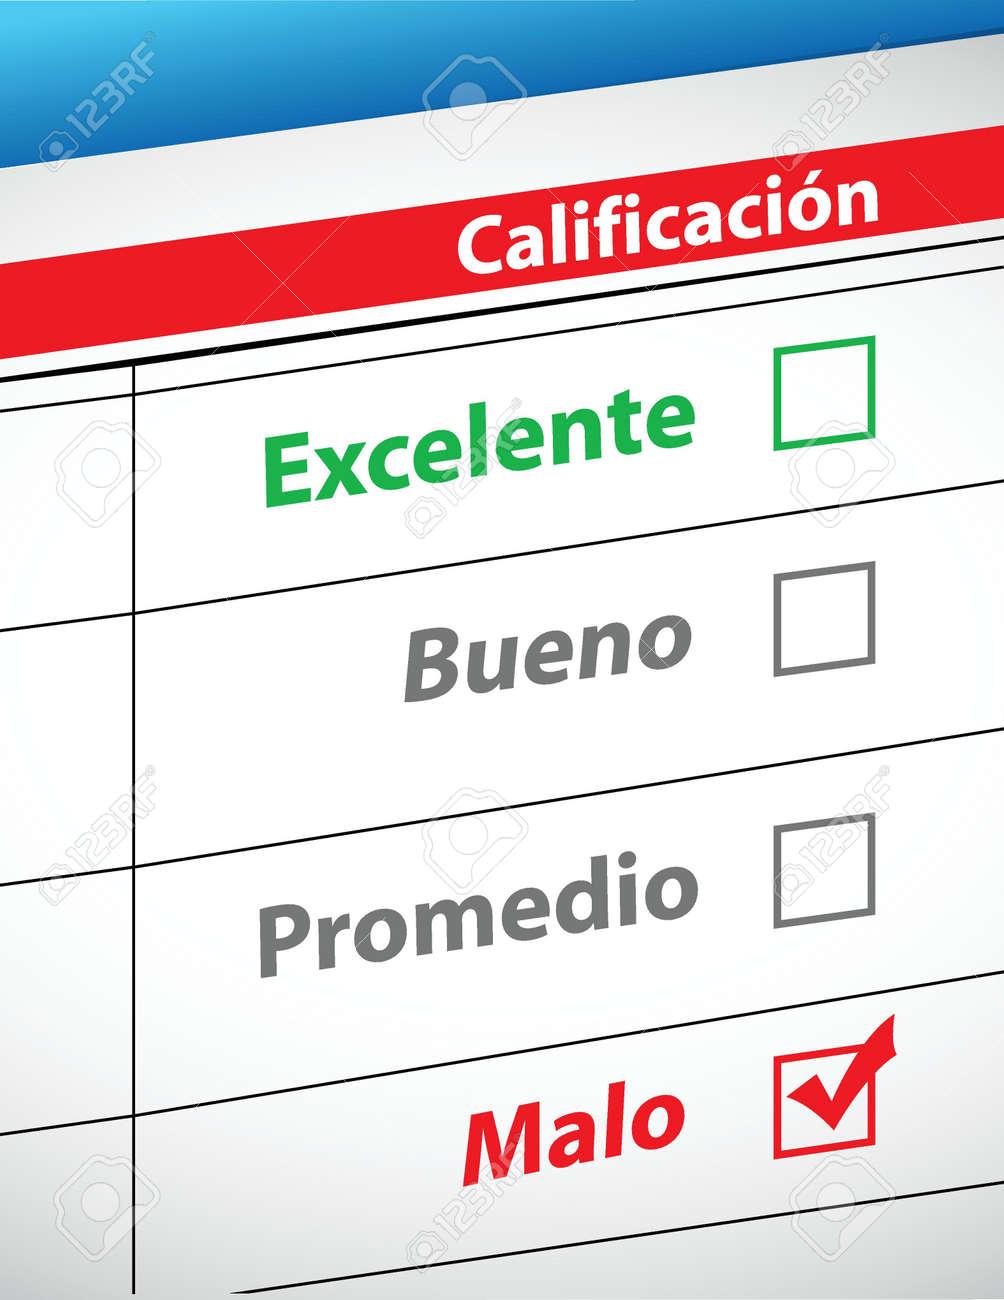 feedback selection concept in Spanish illustration design Stock Vector - 18158677